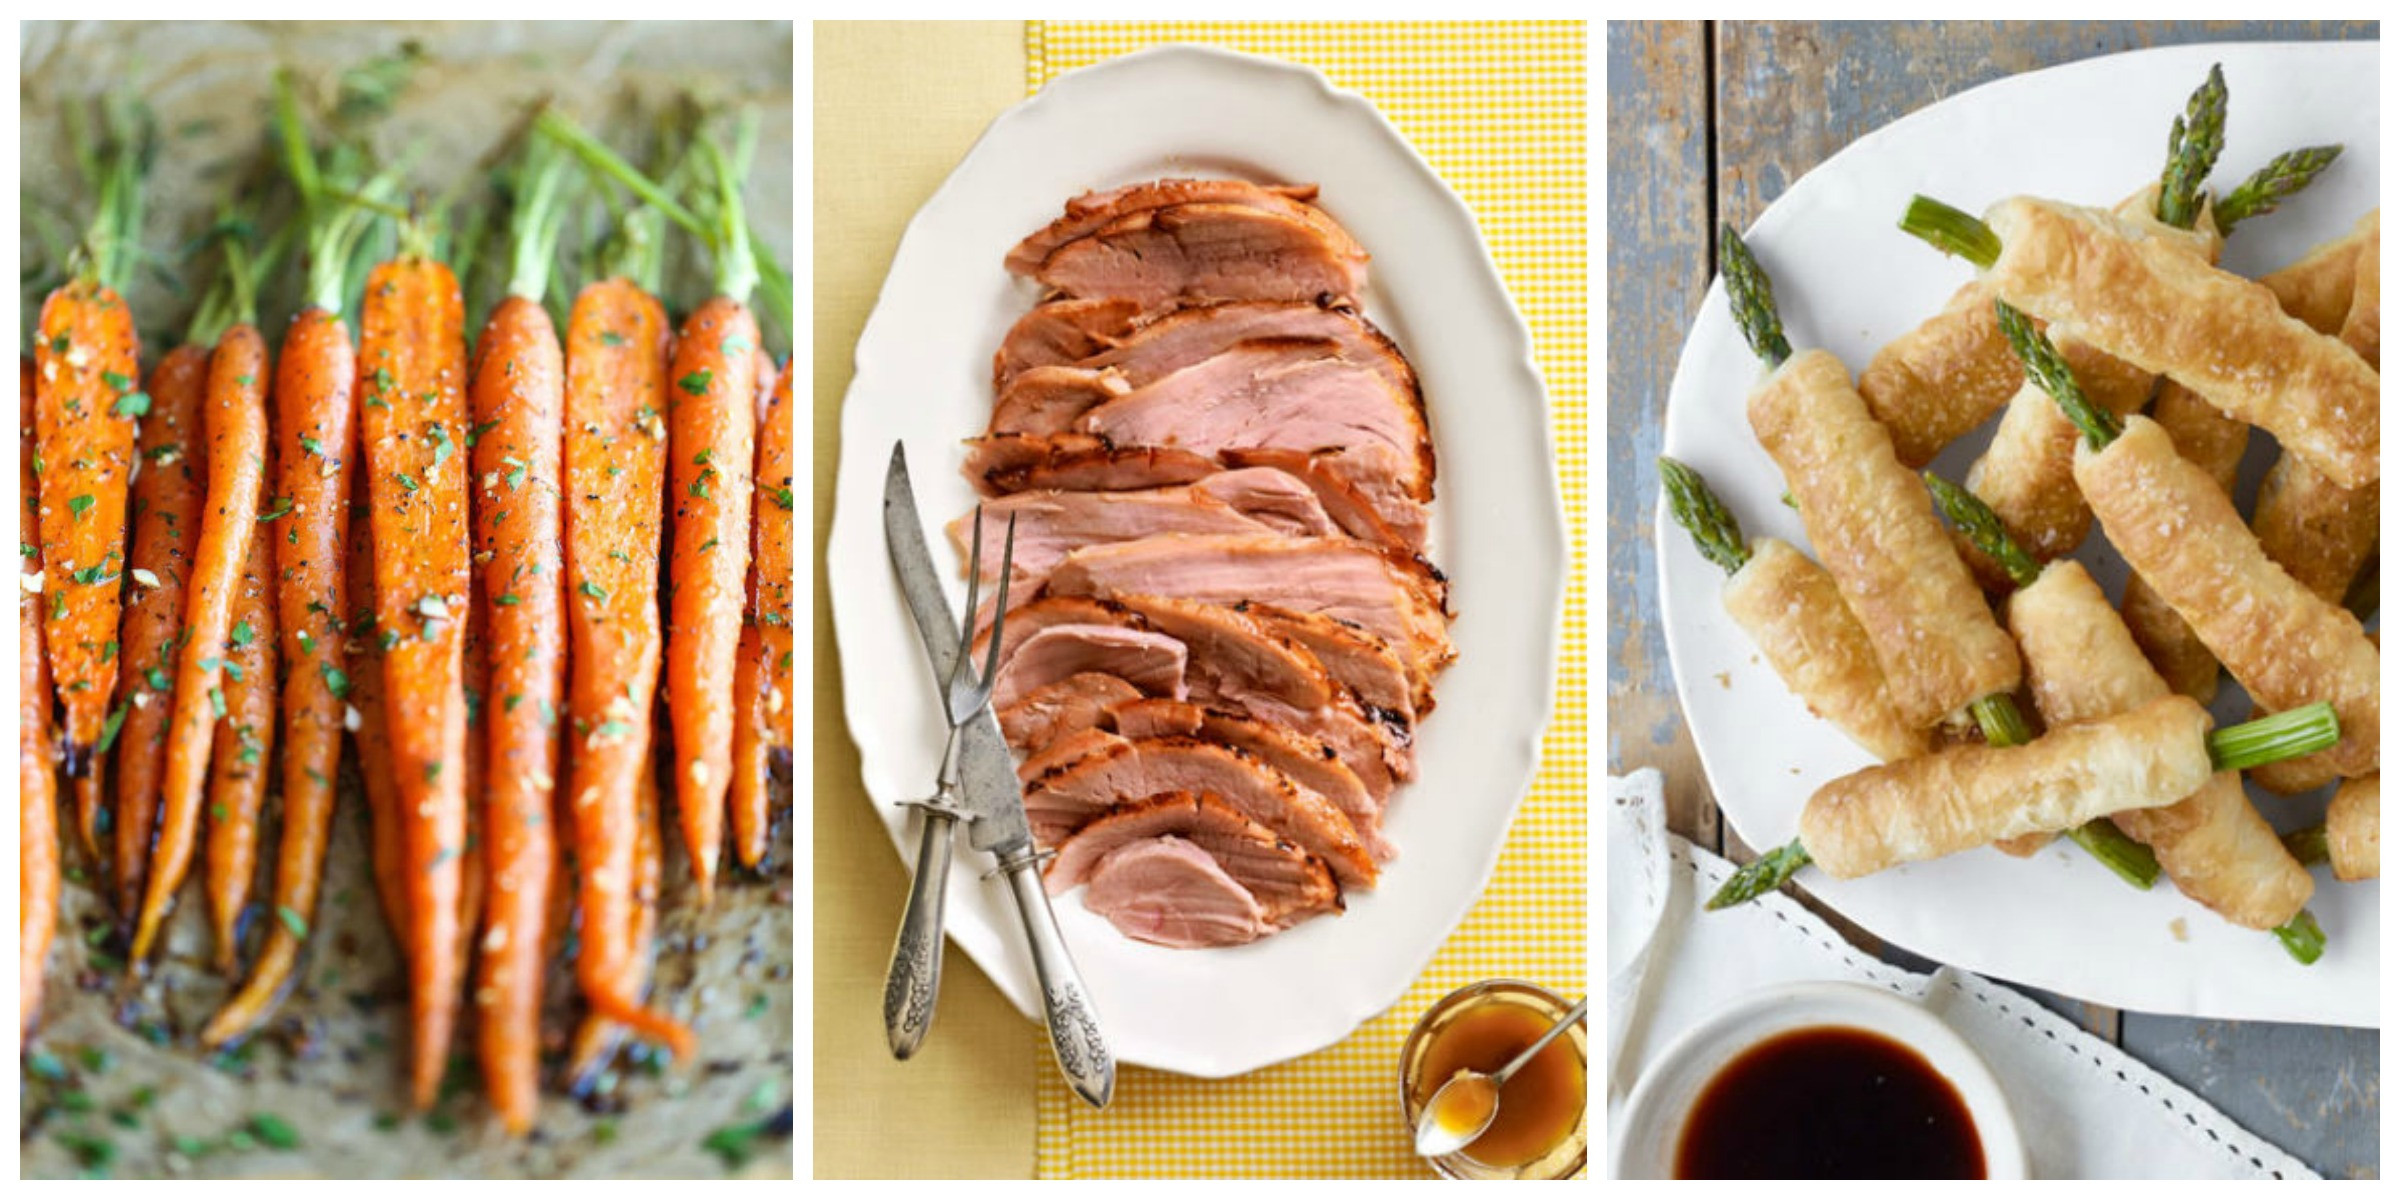 Food For Easter Dinner  70 Easter Dinner Recipes & Food Ideas Easter Menu